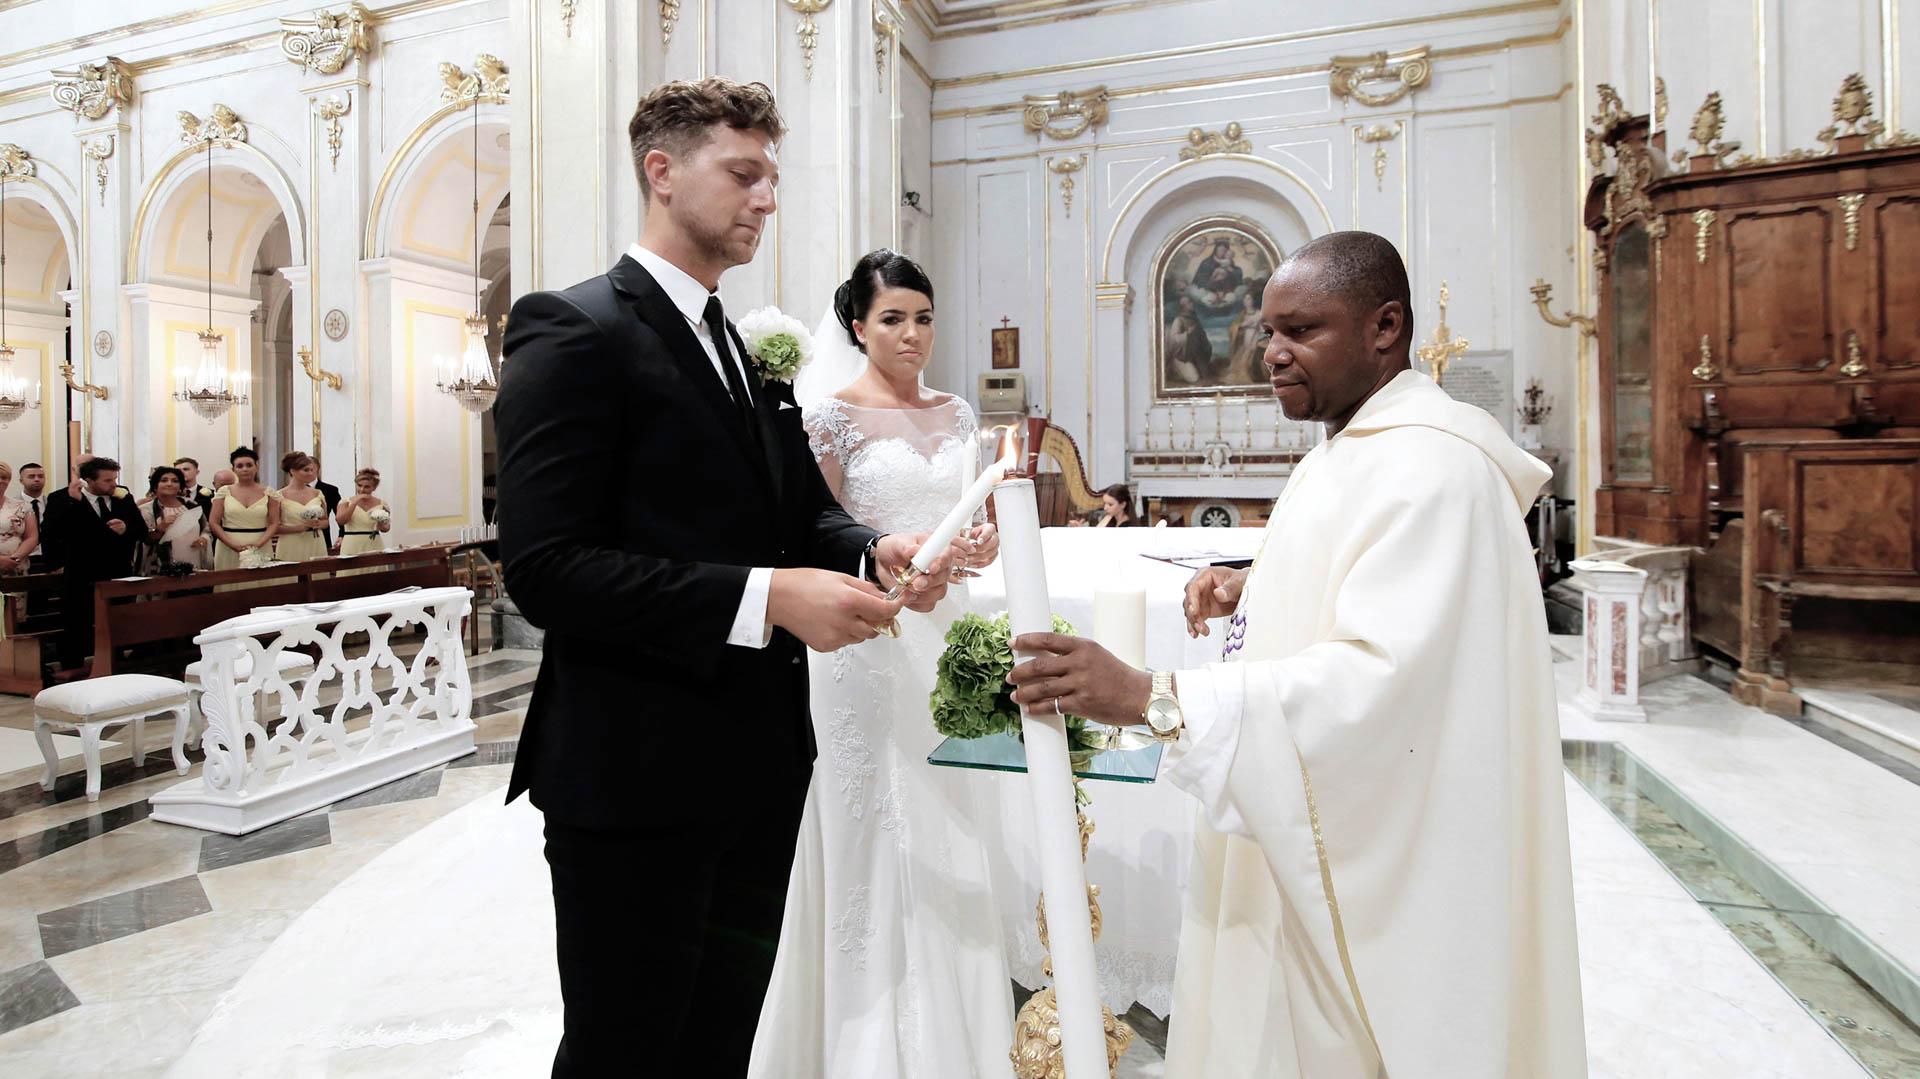 Catholic weddings in Positano cathedral